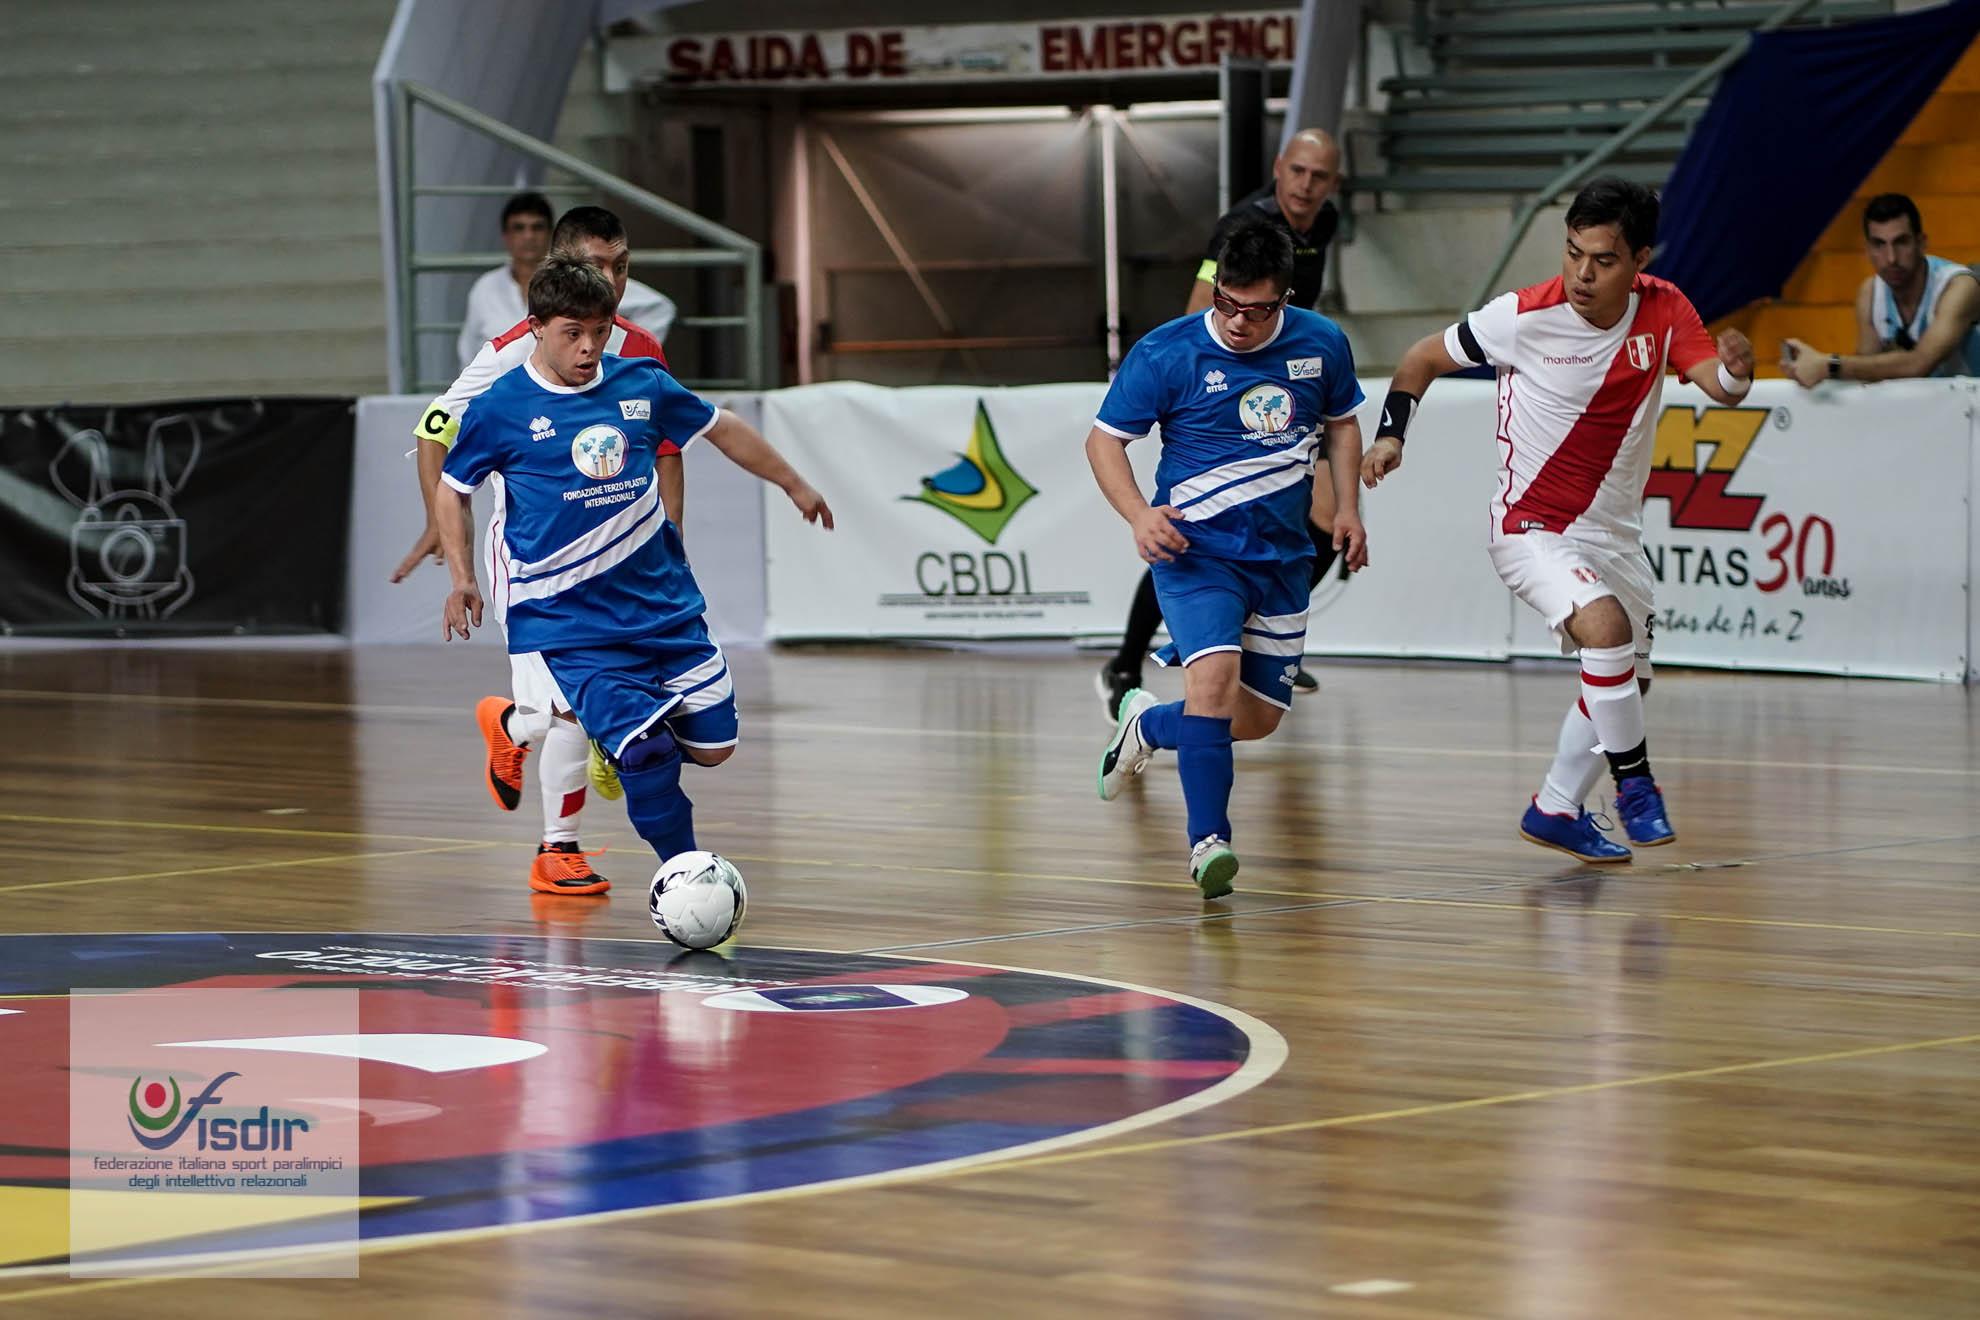 Calcio paralimpico, tavolo tecnico con la FIGC